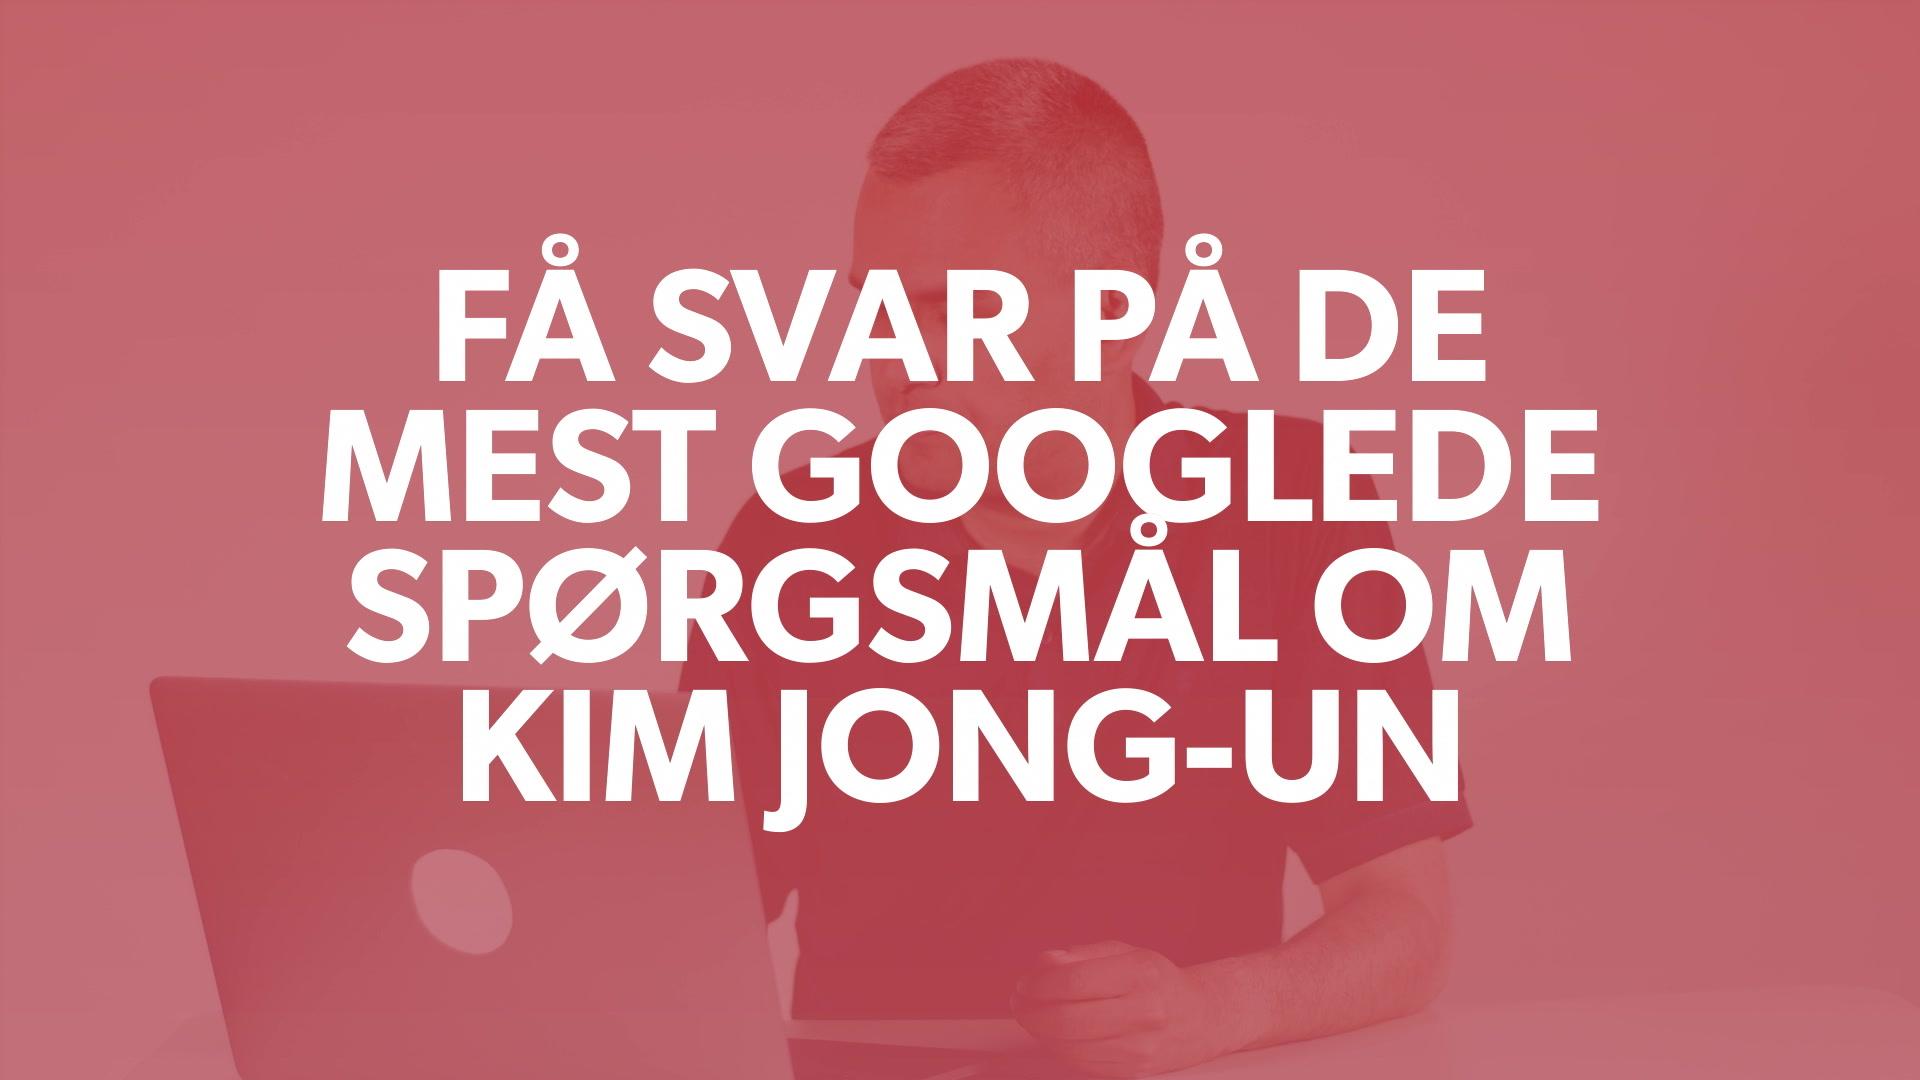 thml_a_nordkorea_-_google_drdktekst-00.00.08.05_0.jpg